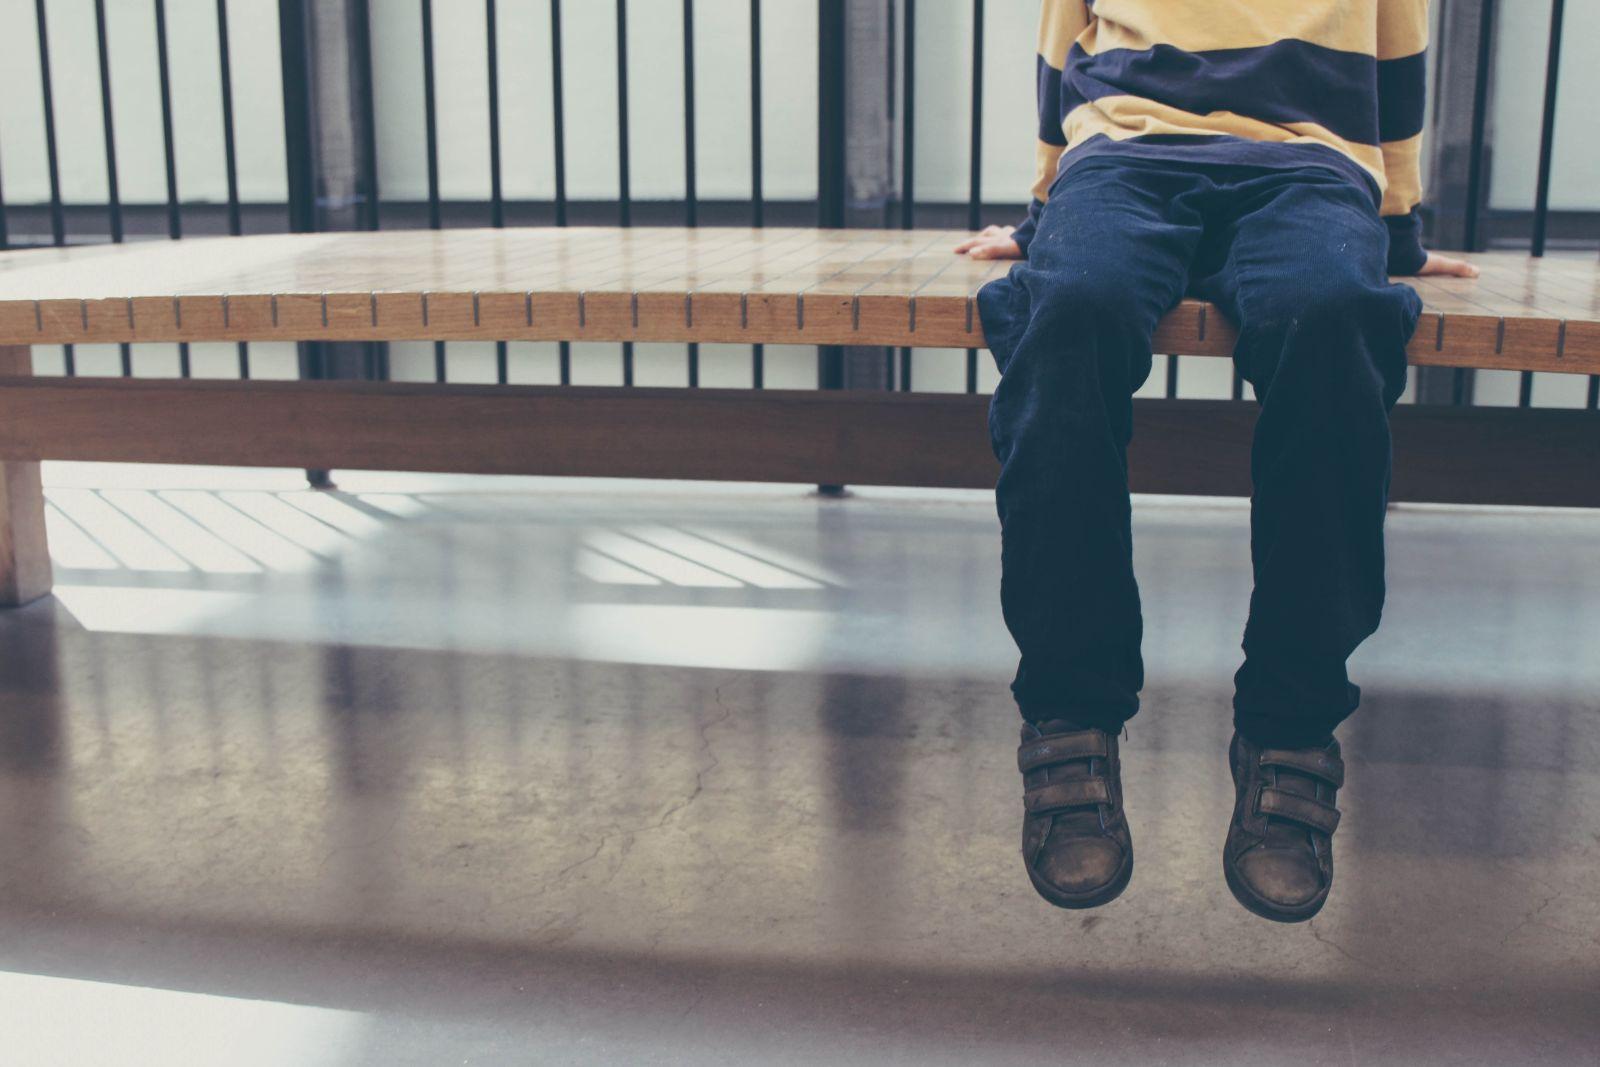 Speaking to children with autism